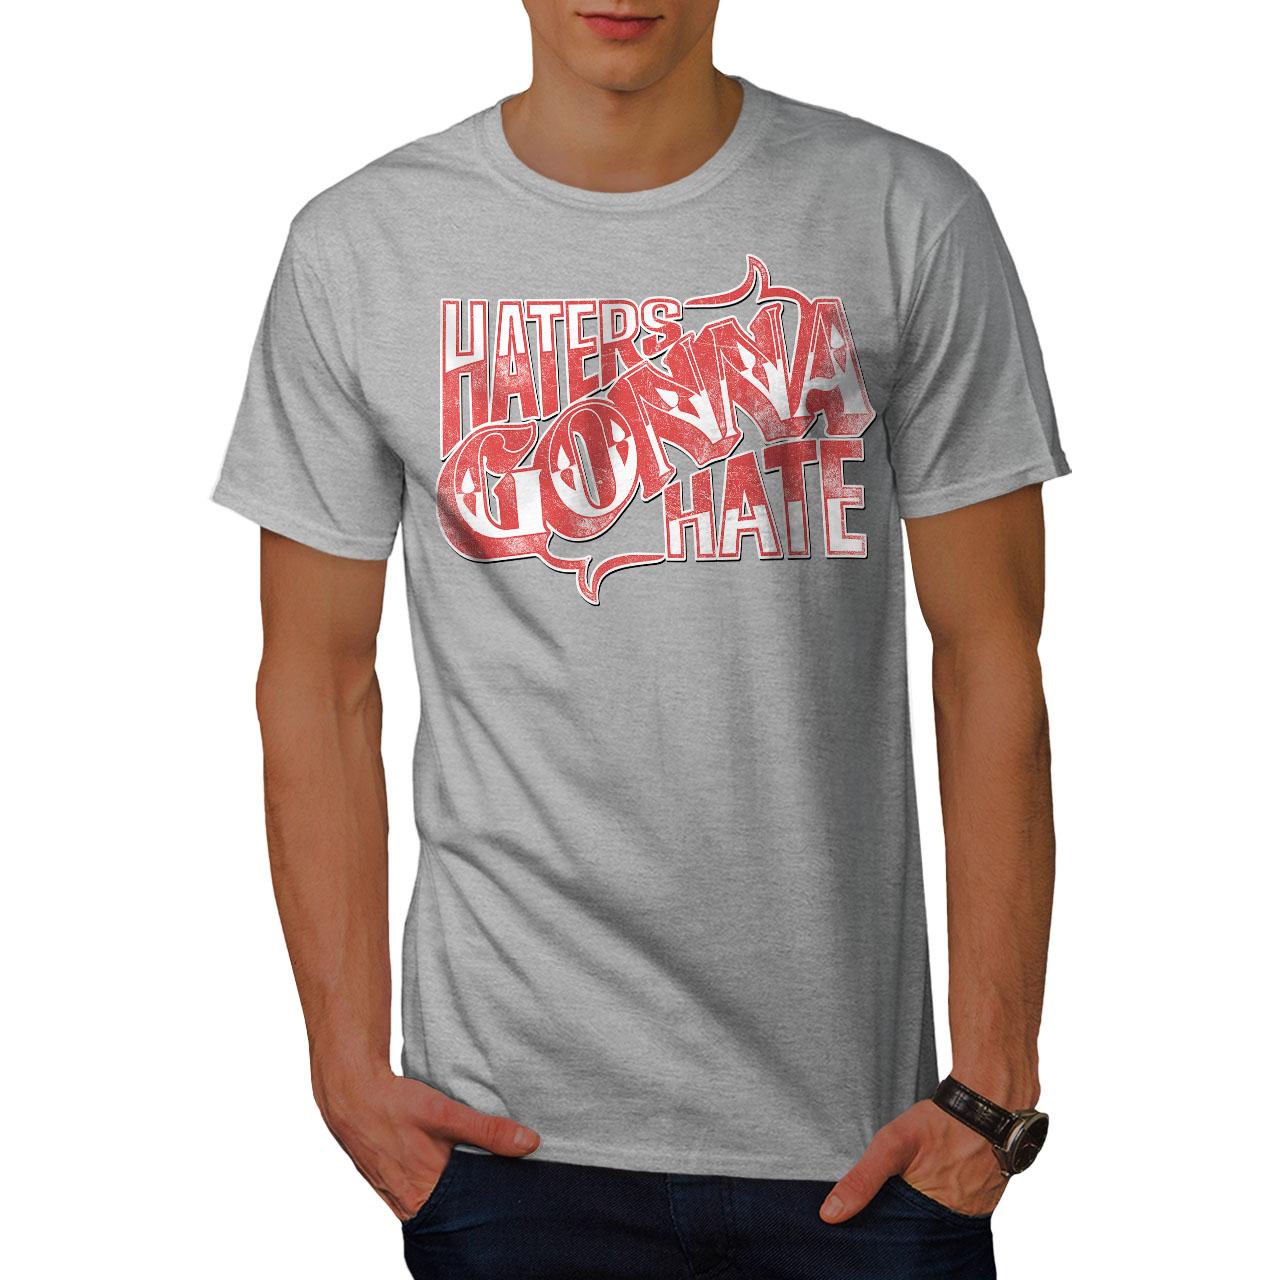 Wellcoda-Wasser-hassen-Zitat-Slogan-Herren-T-Shirt-True-Grafikdesign-Printed-Tee